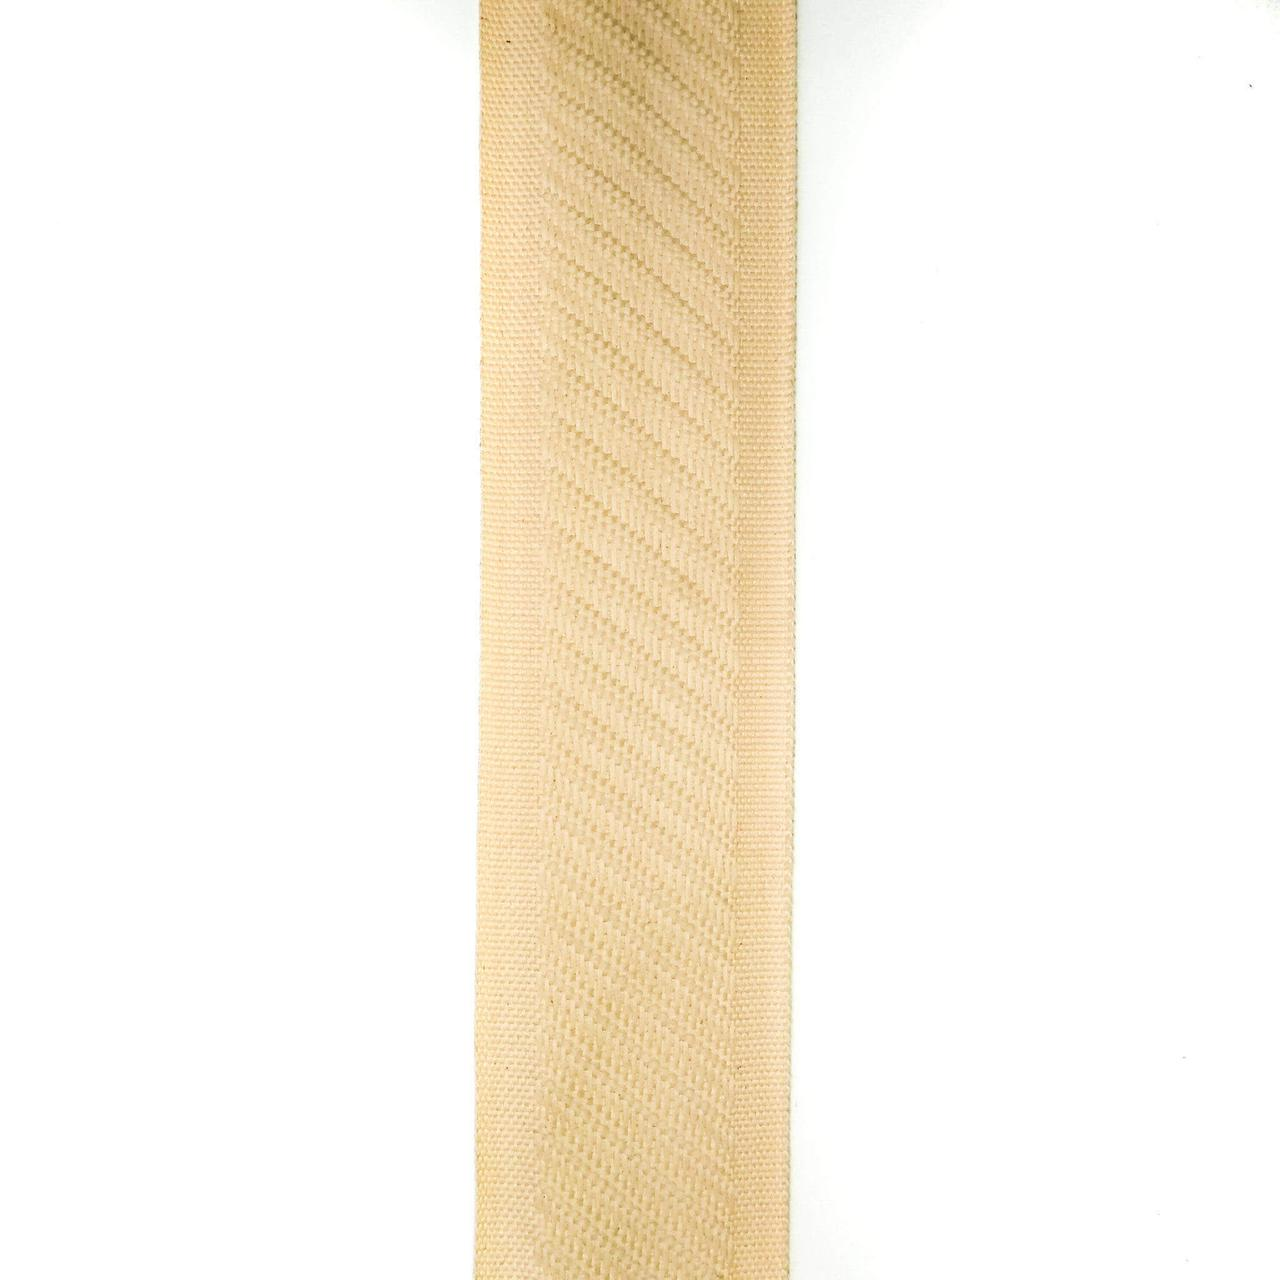 Лента отделочная одеяльная 39 мм (50м/рулон)